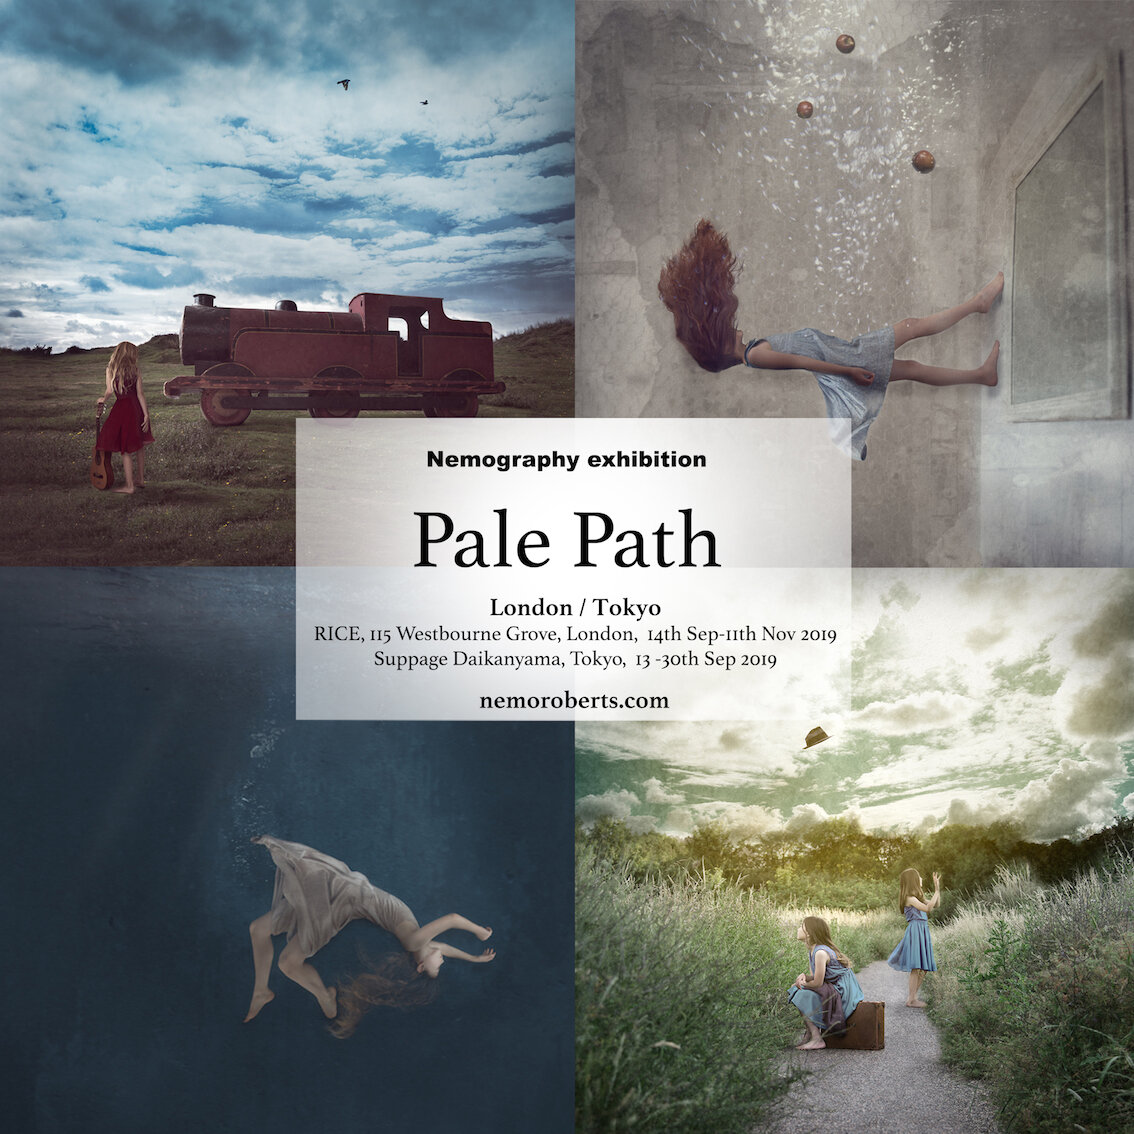 PalePath2019-nemoroberts-flyer-mini.jpg